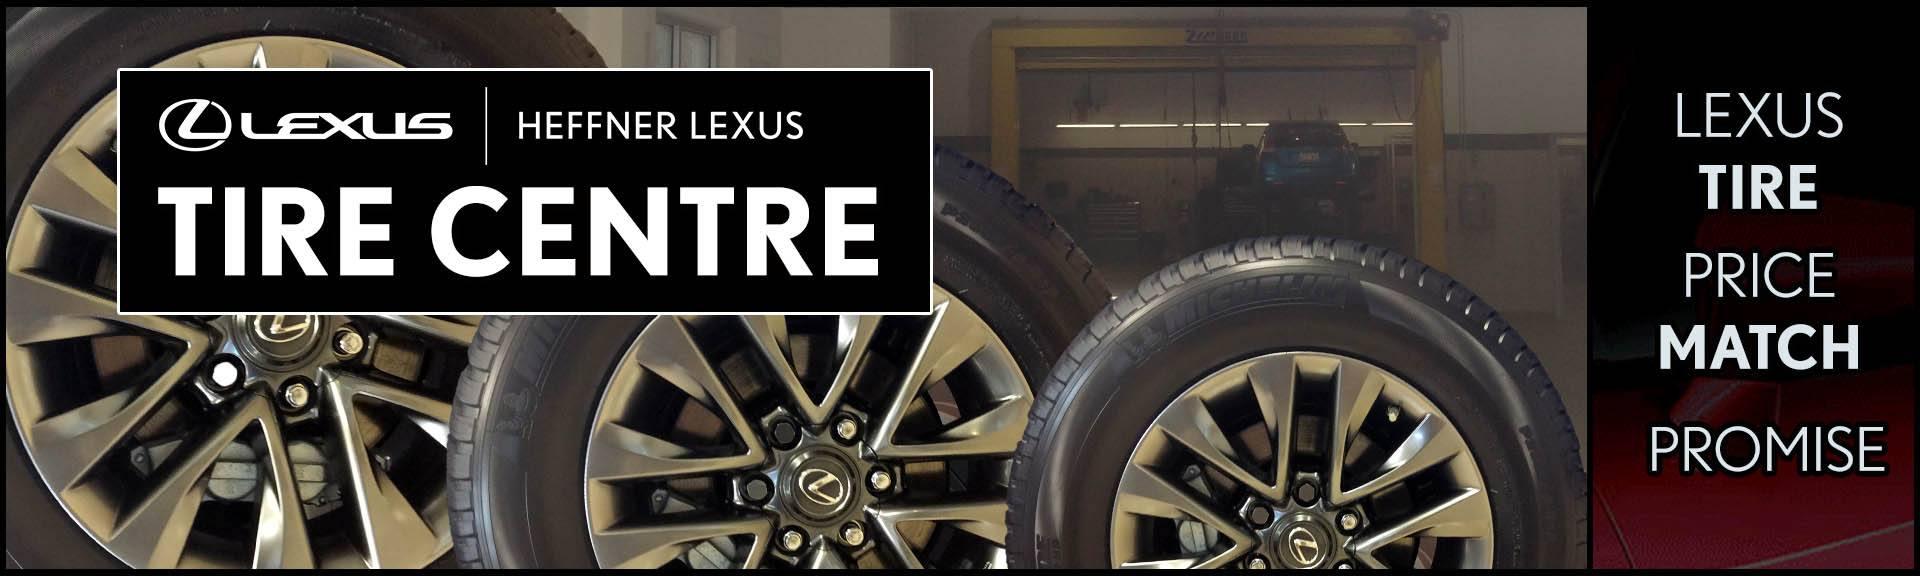 Lexus Tire Centre Banner Ad